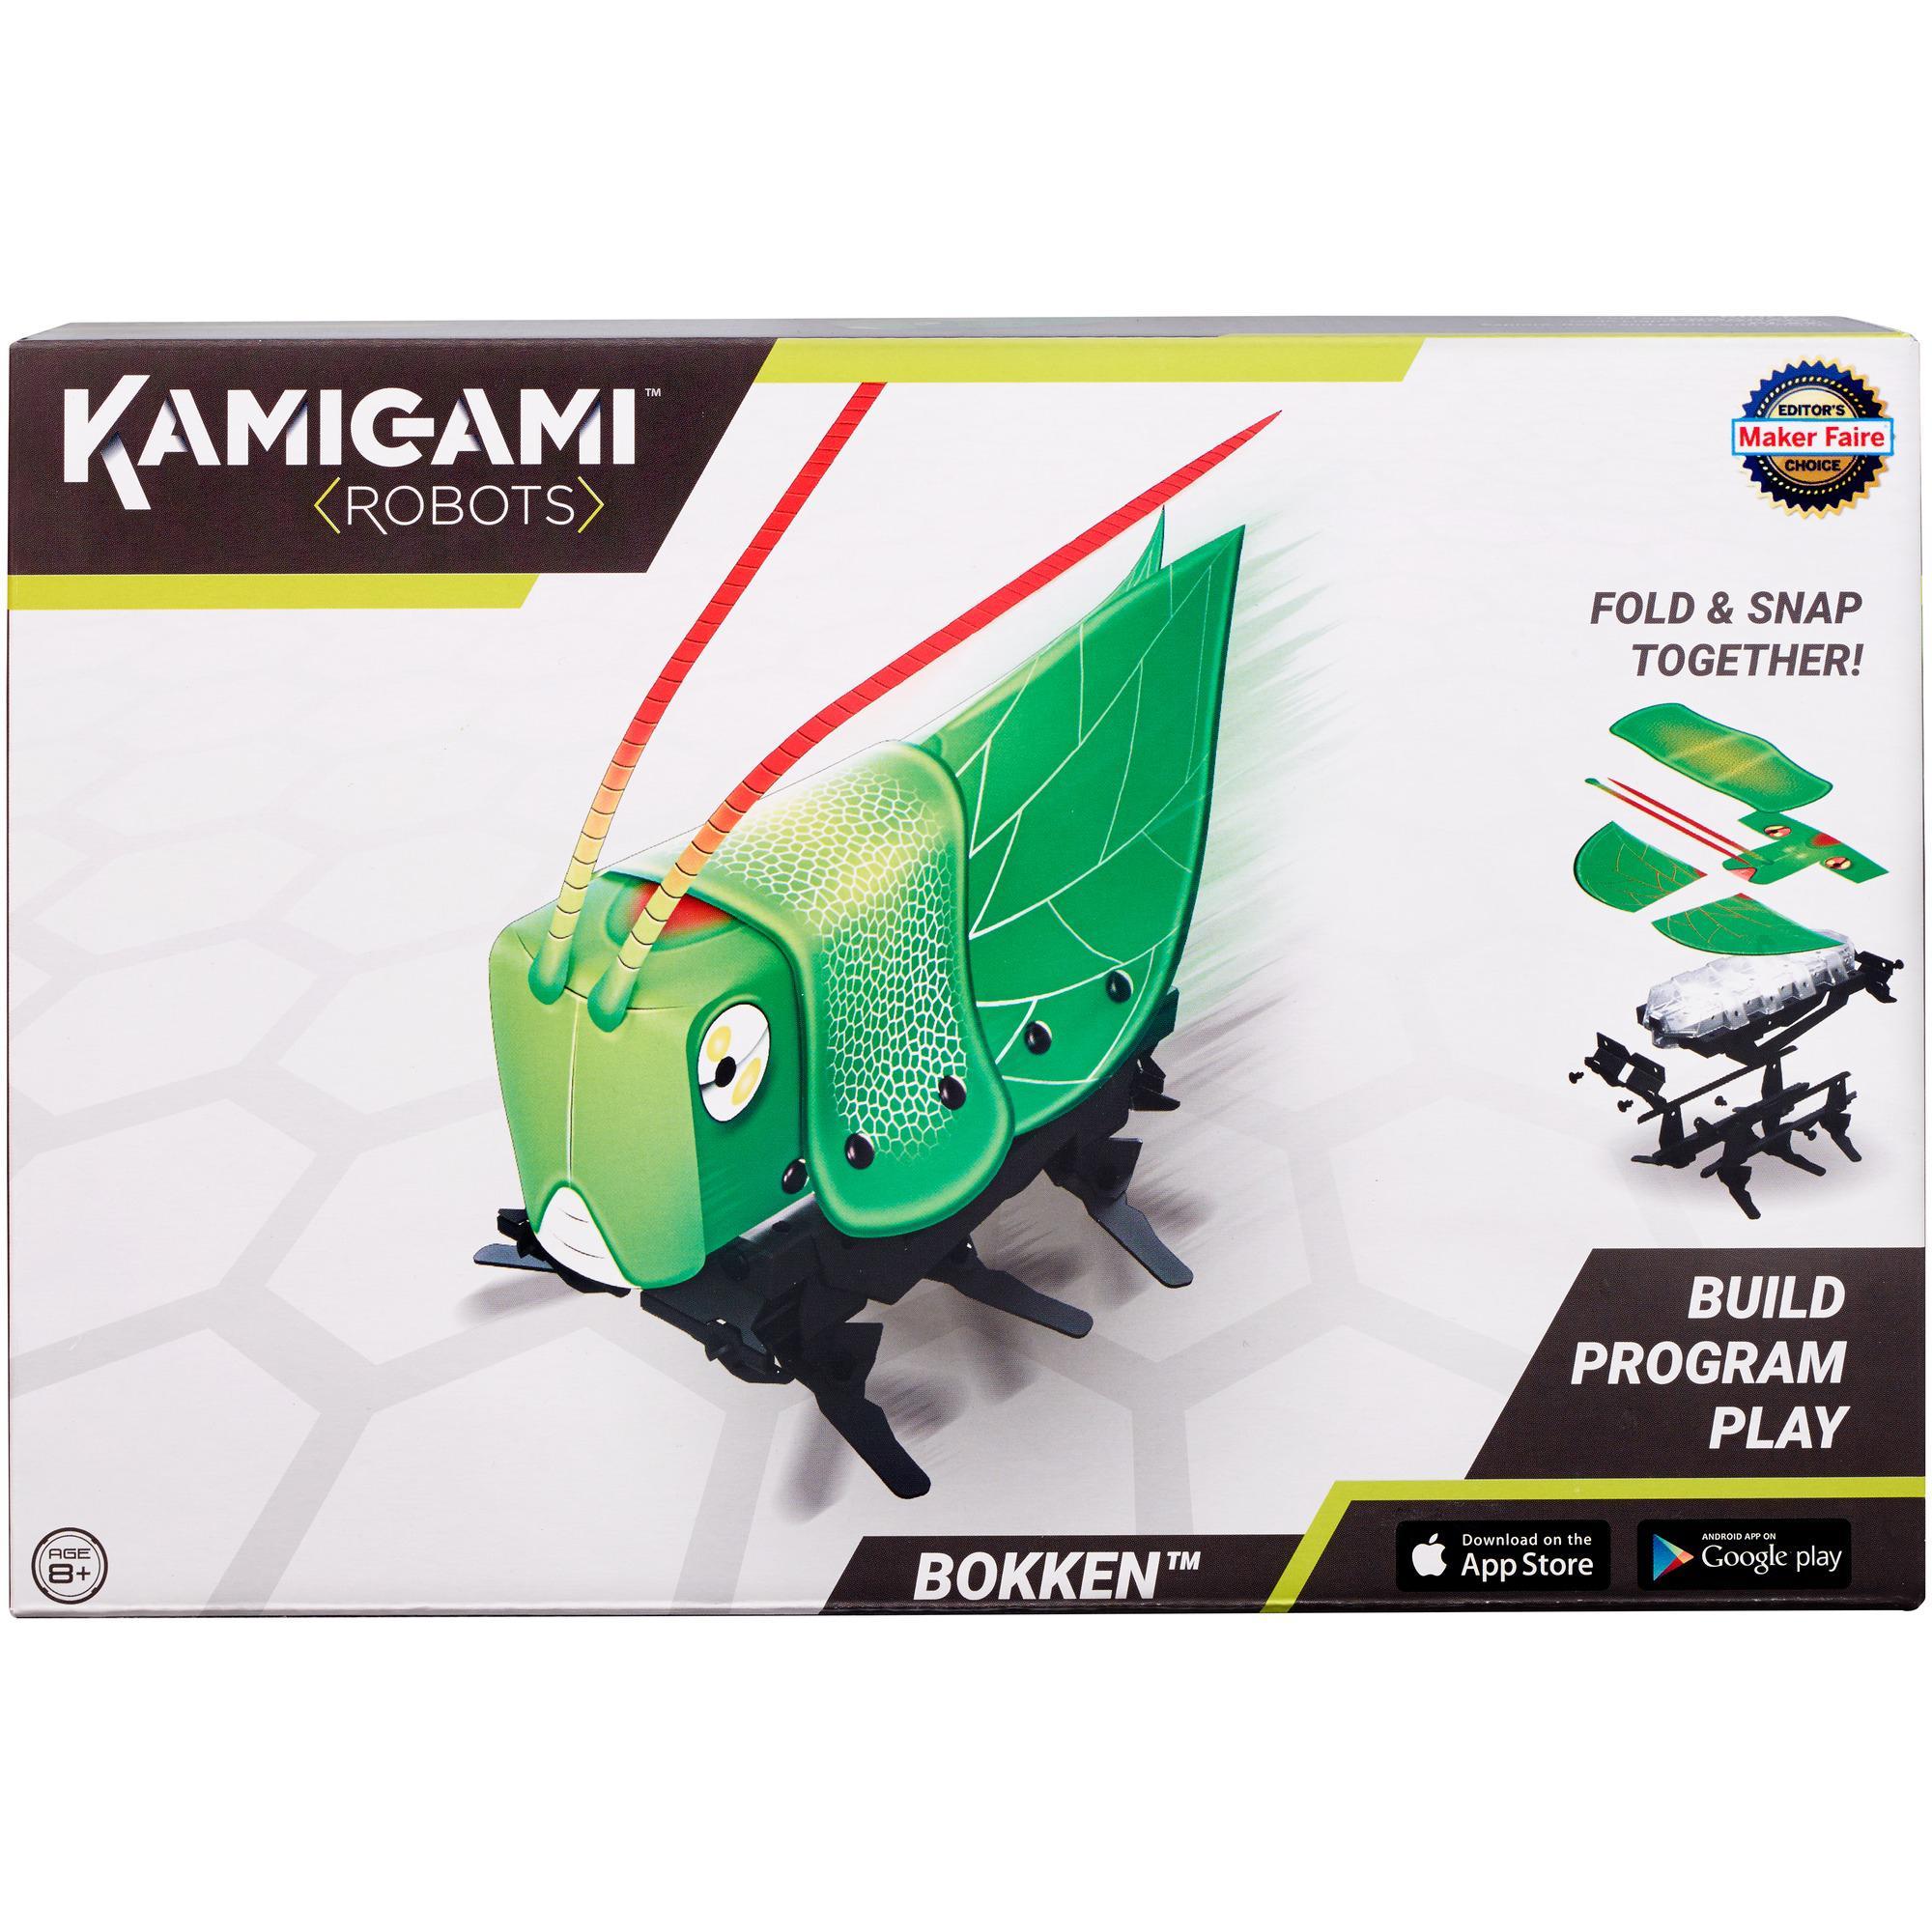 Kamigami Bokken Grasshopper Build Program Play Engineering STEM Robot